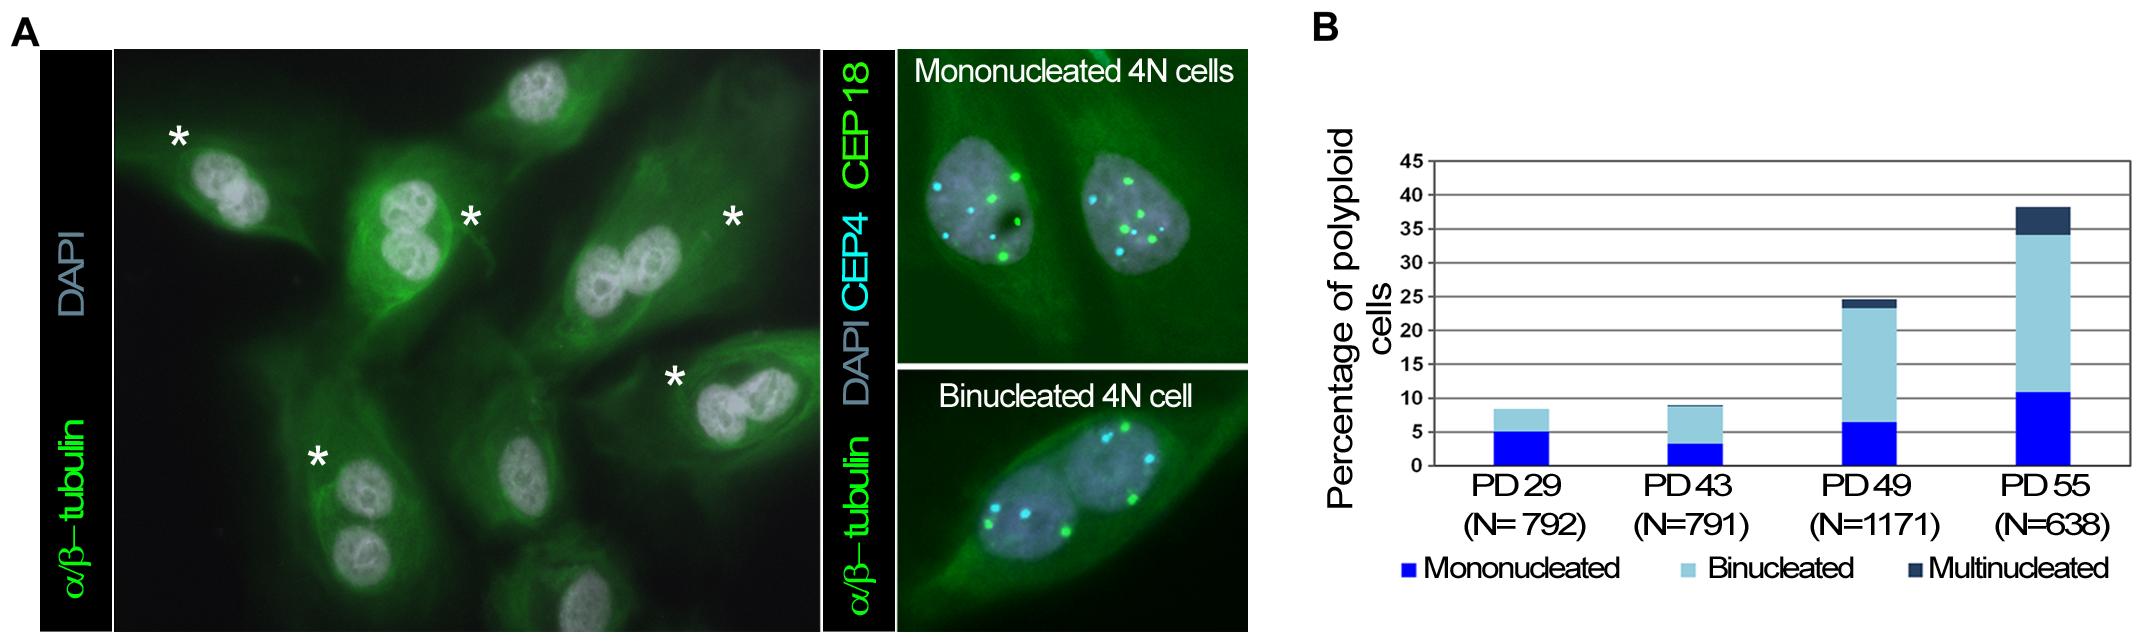 Polyploid HMECs arise through incomplete cytokinesis.